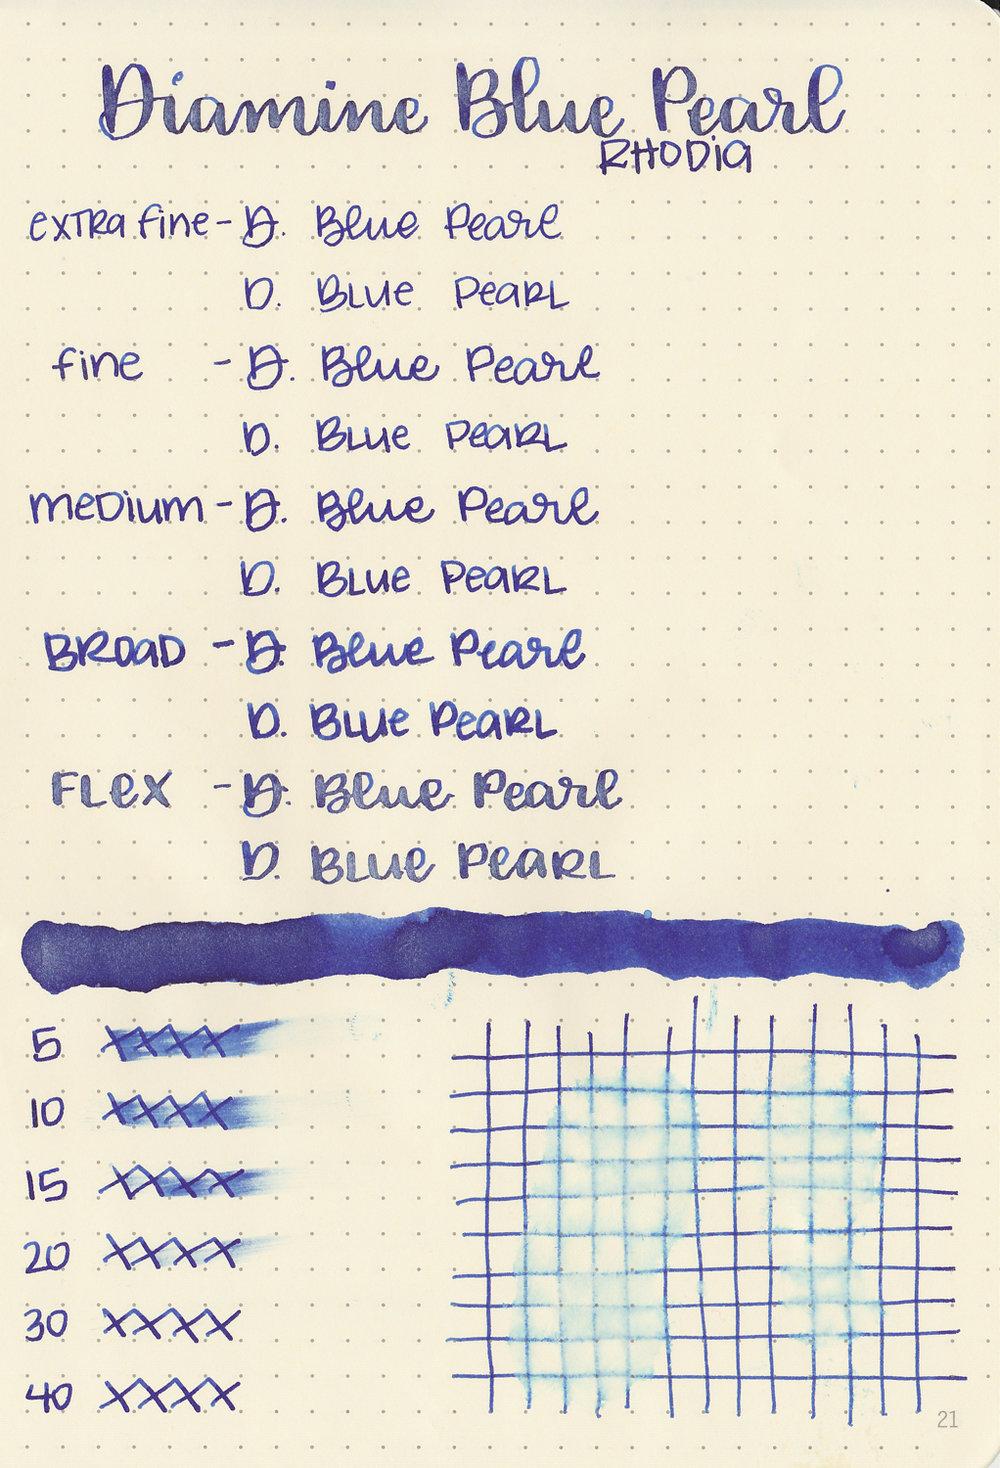 d-blue-pearl-5.jpg